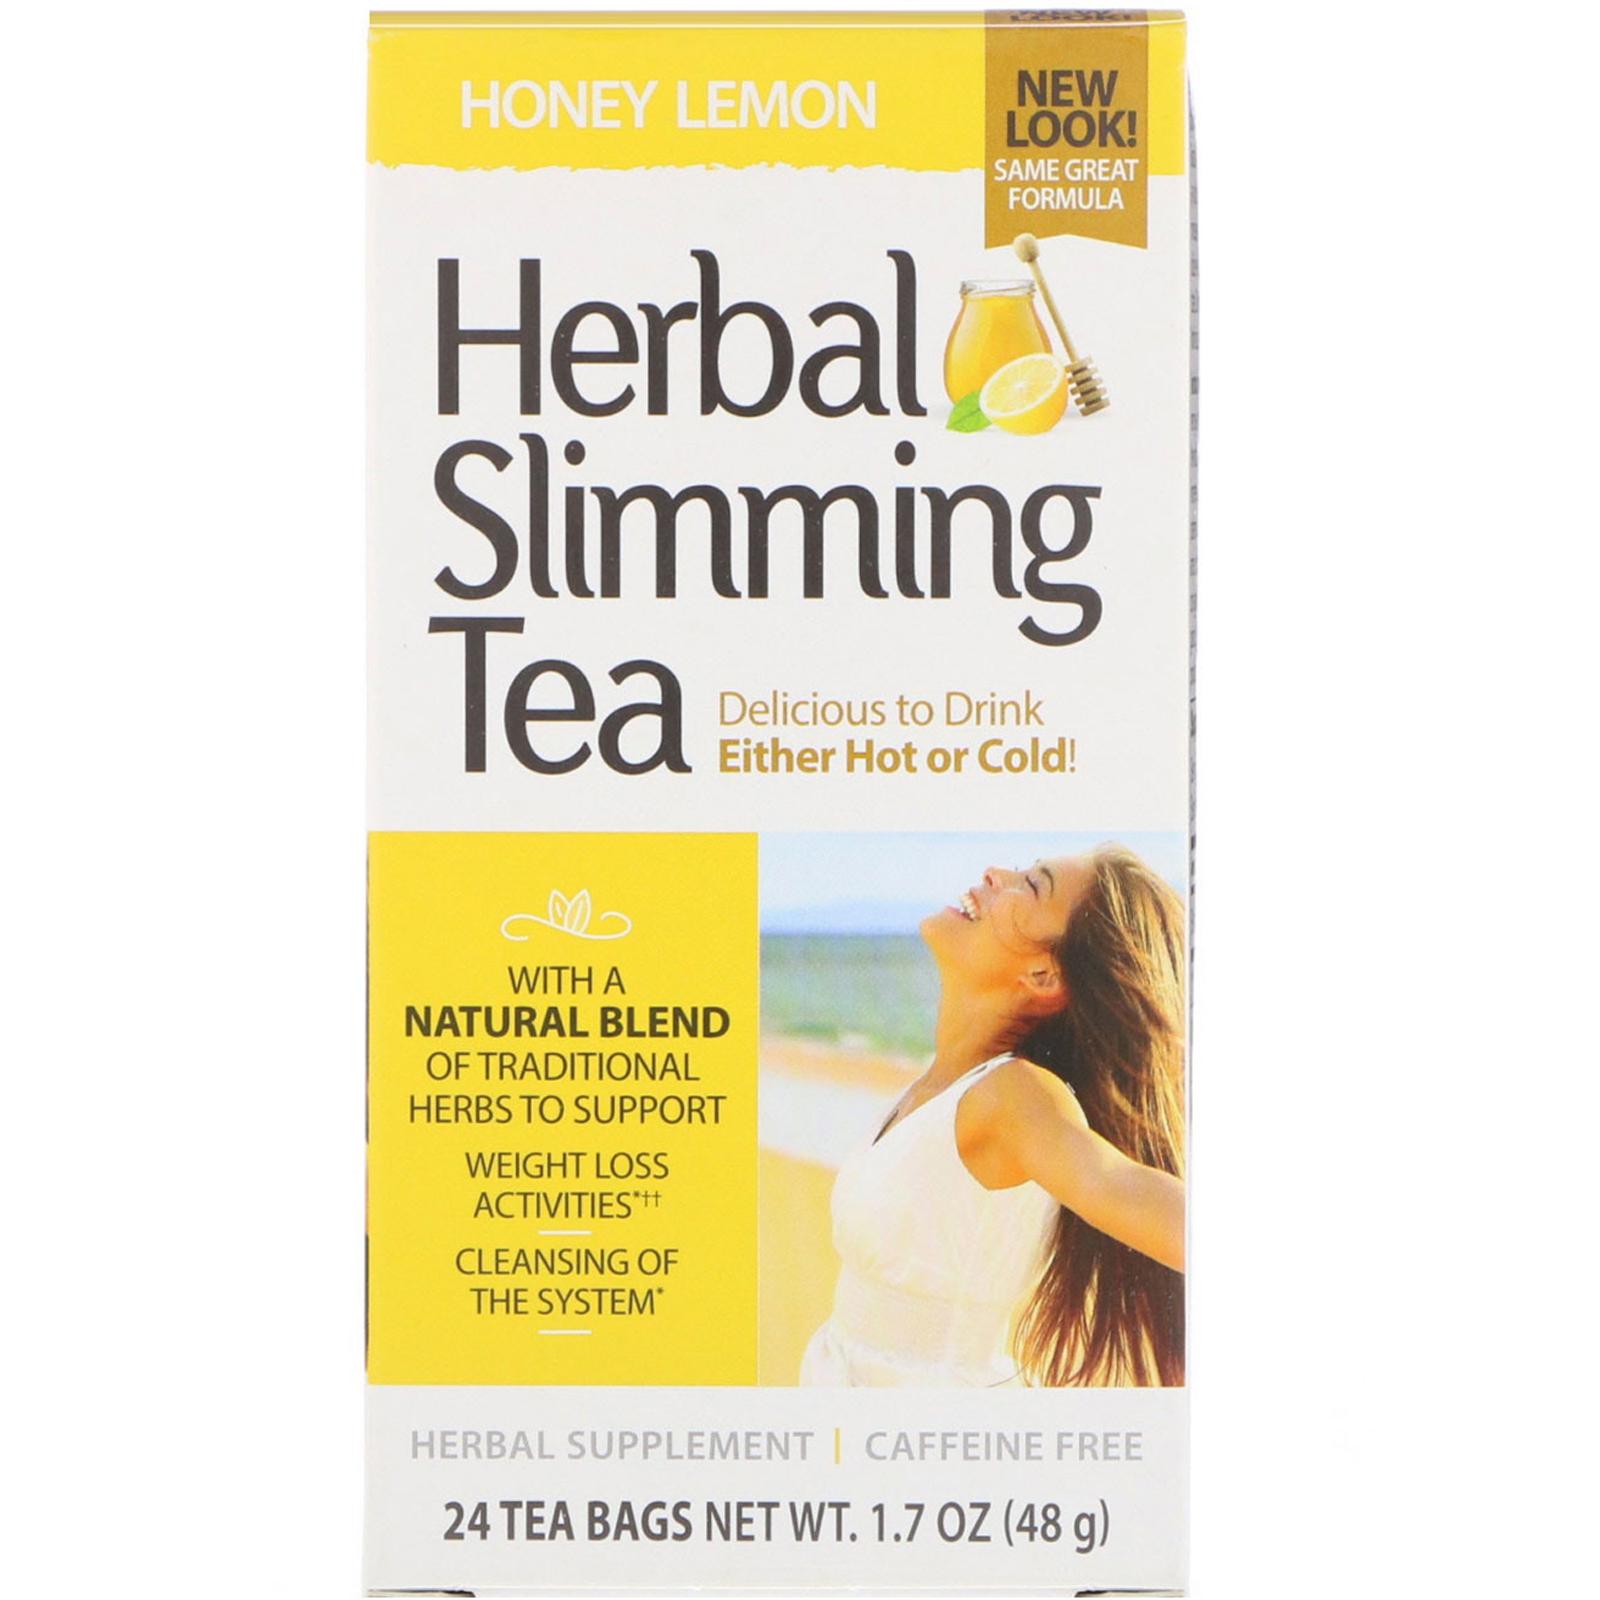 21st Century, Herbal Slimming Tea, Honey Lemon, Caffeine Free, 24